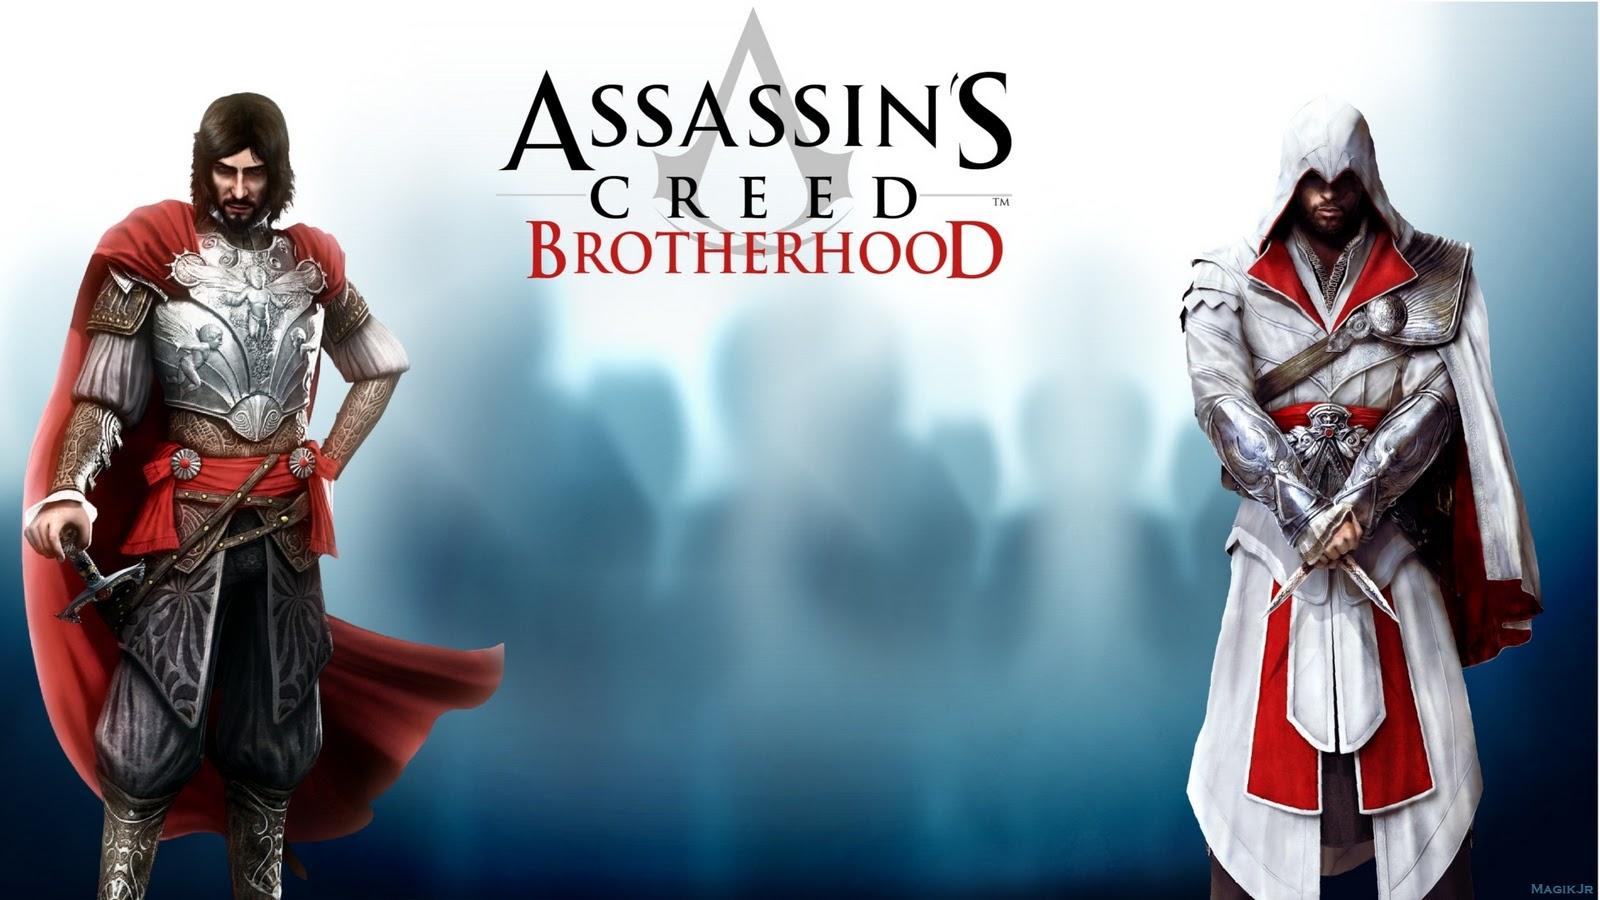 http://2.bp.blogspot.com/_CZ2c7s-BEto/TOZZjCW4DZI/AAAAAAAAAKI/gCoVYDs6LEM/s1600/12894004801080p2_brotherhood.jpg